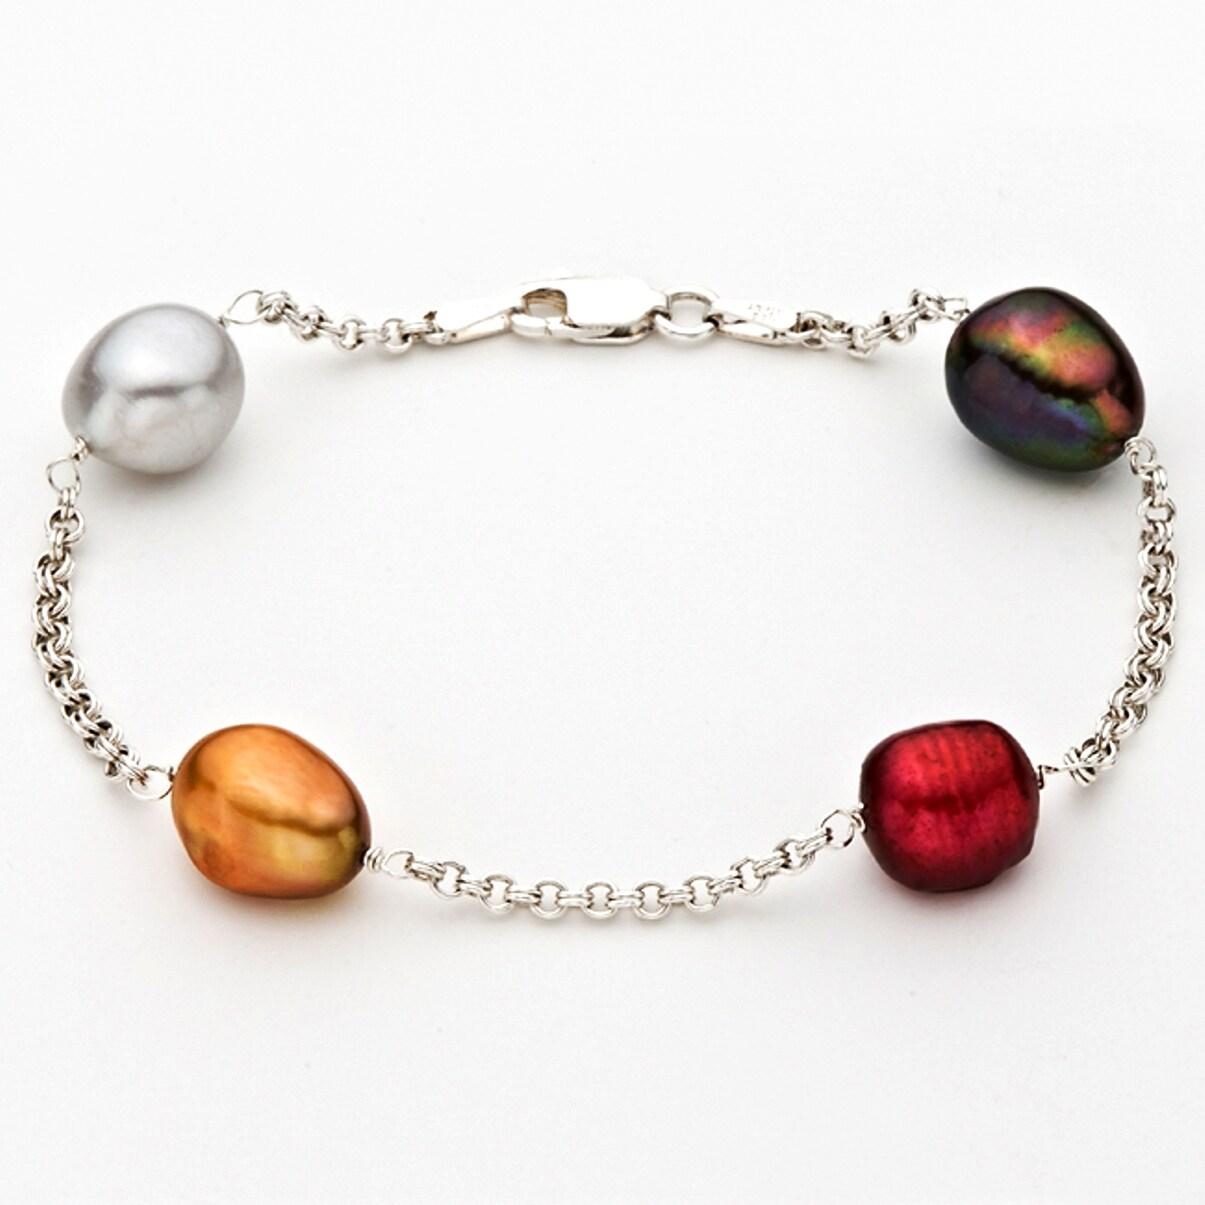 Pearlyta Multicolored FW Baroque Pearl Tin Cup Rolo Chain...